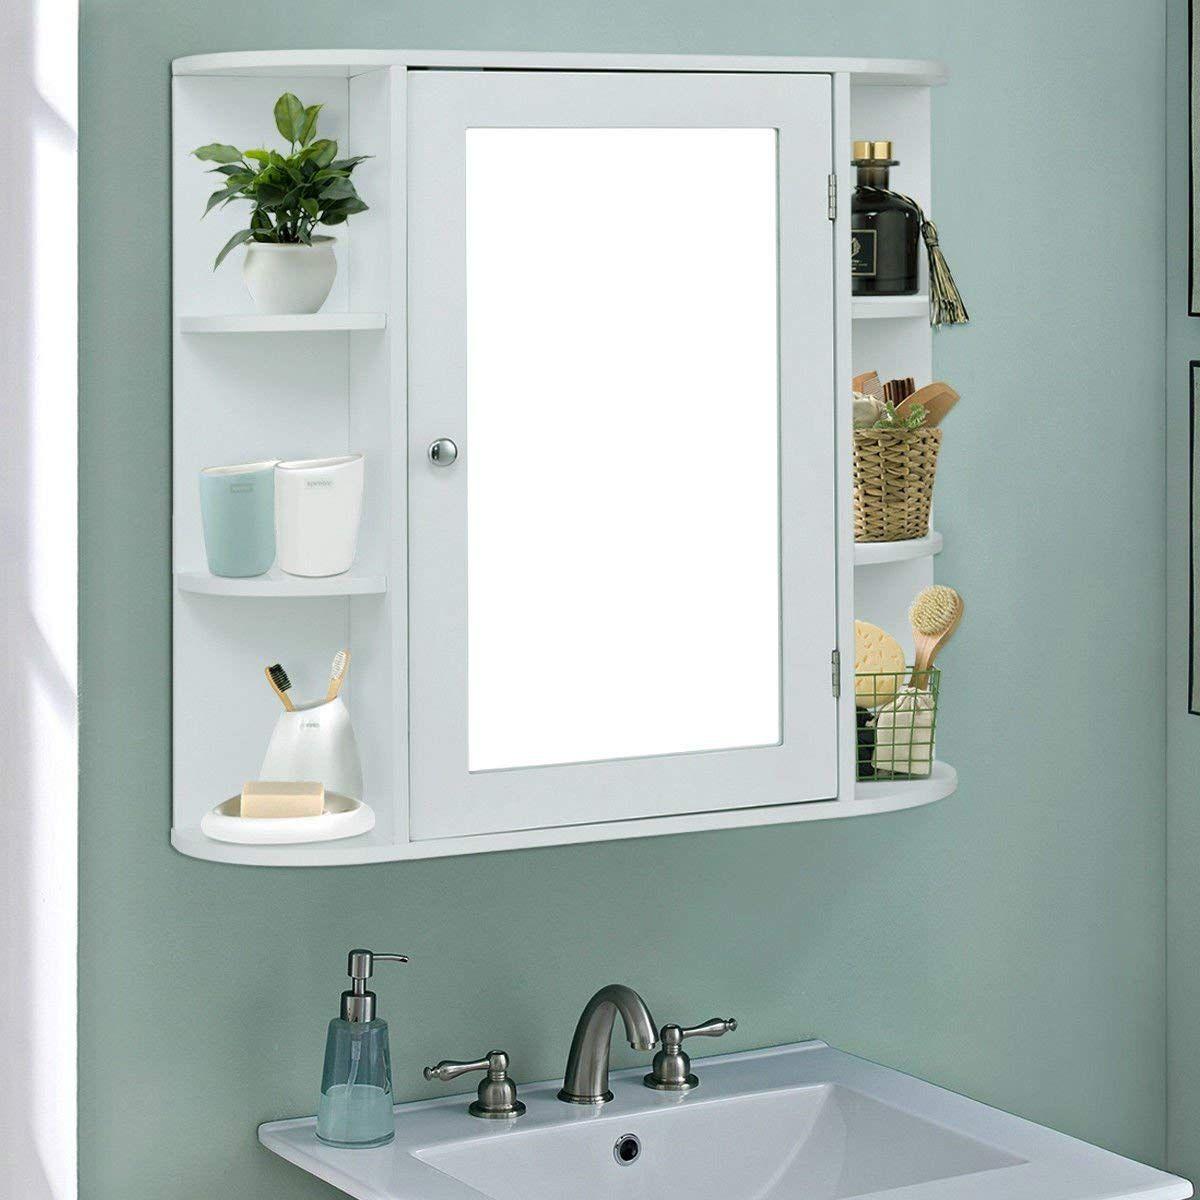 Giantex Wall Mounted Bathroom Storage Cabinet Multipurpose